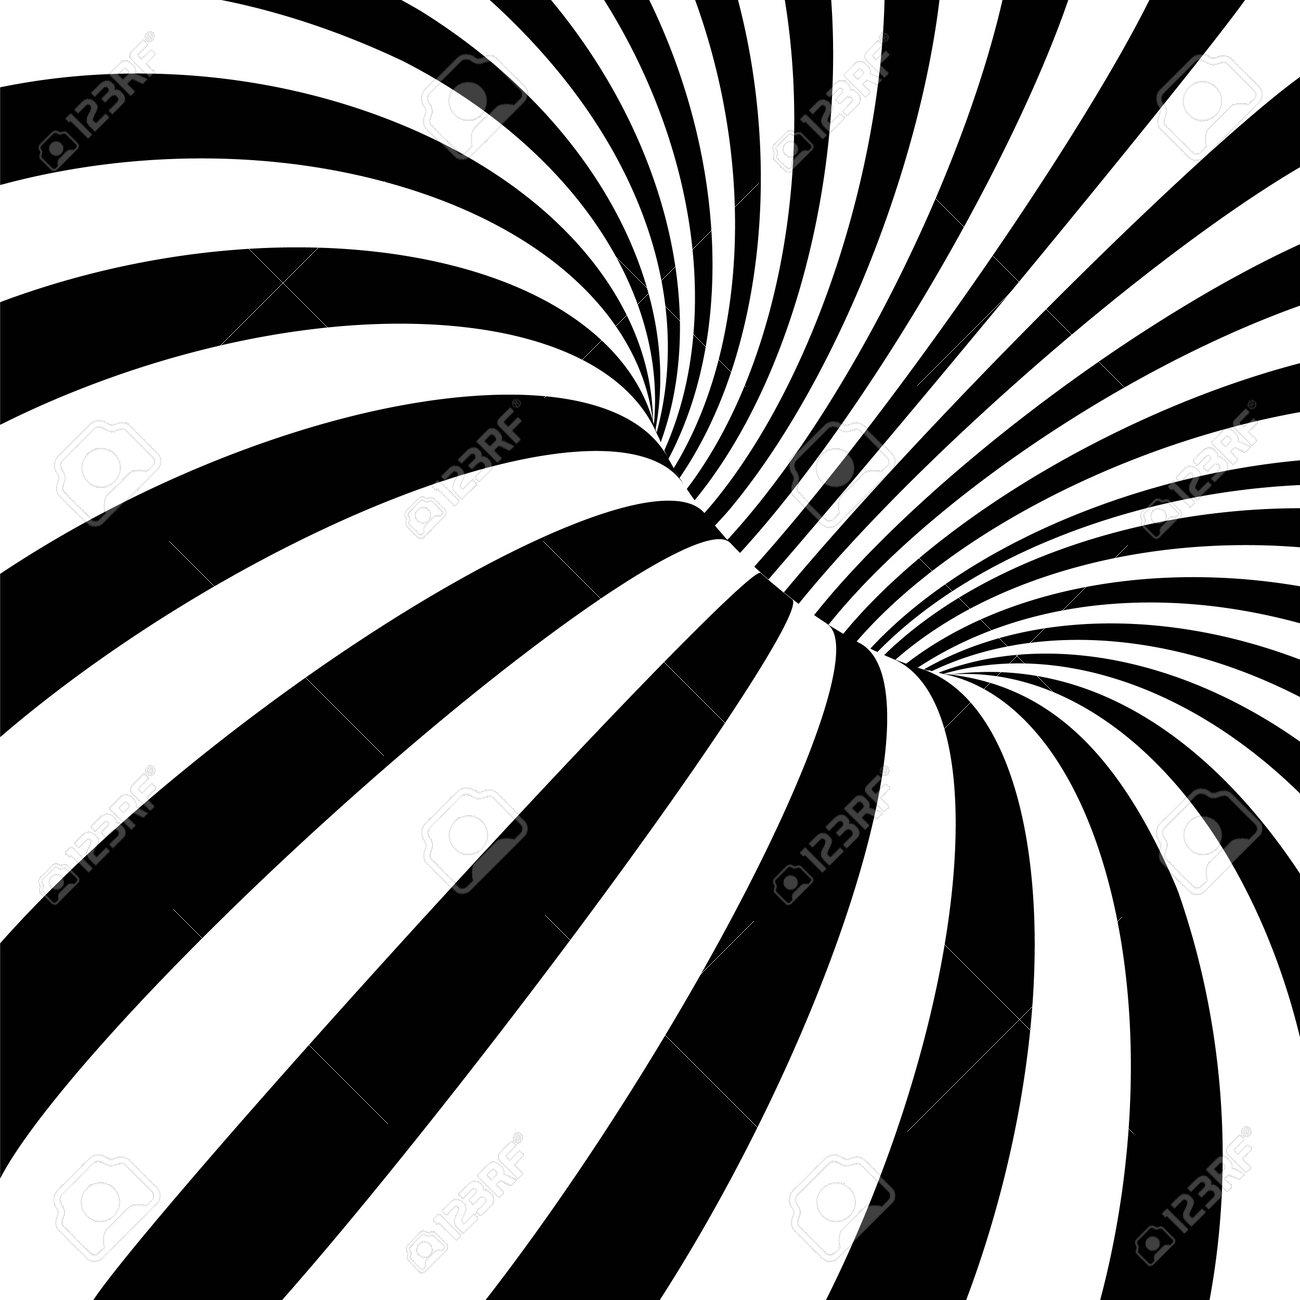 Striped crater on white background. Black stripes on modern circular geometric shape design vector illustration. Graphic optical illusion vortex effect - 163402789